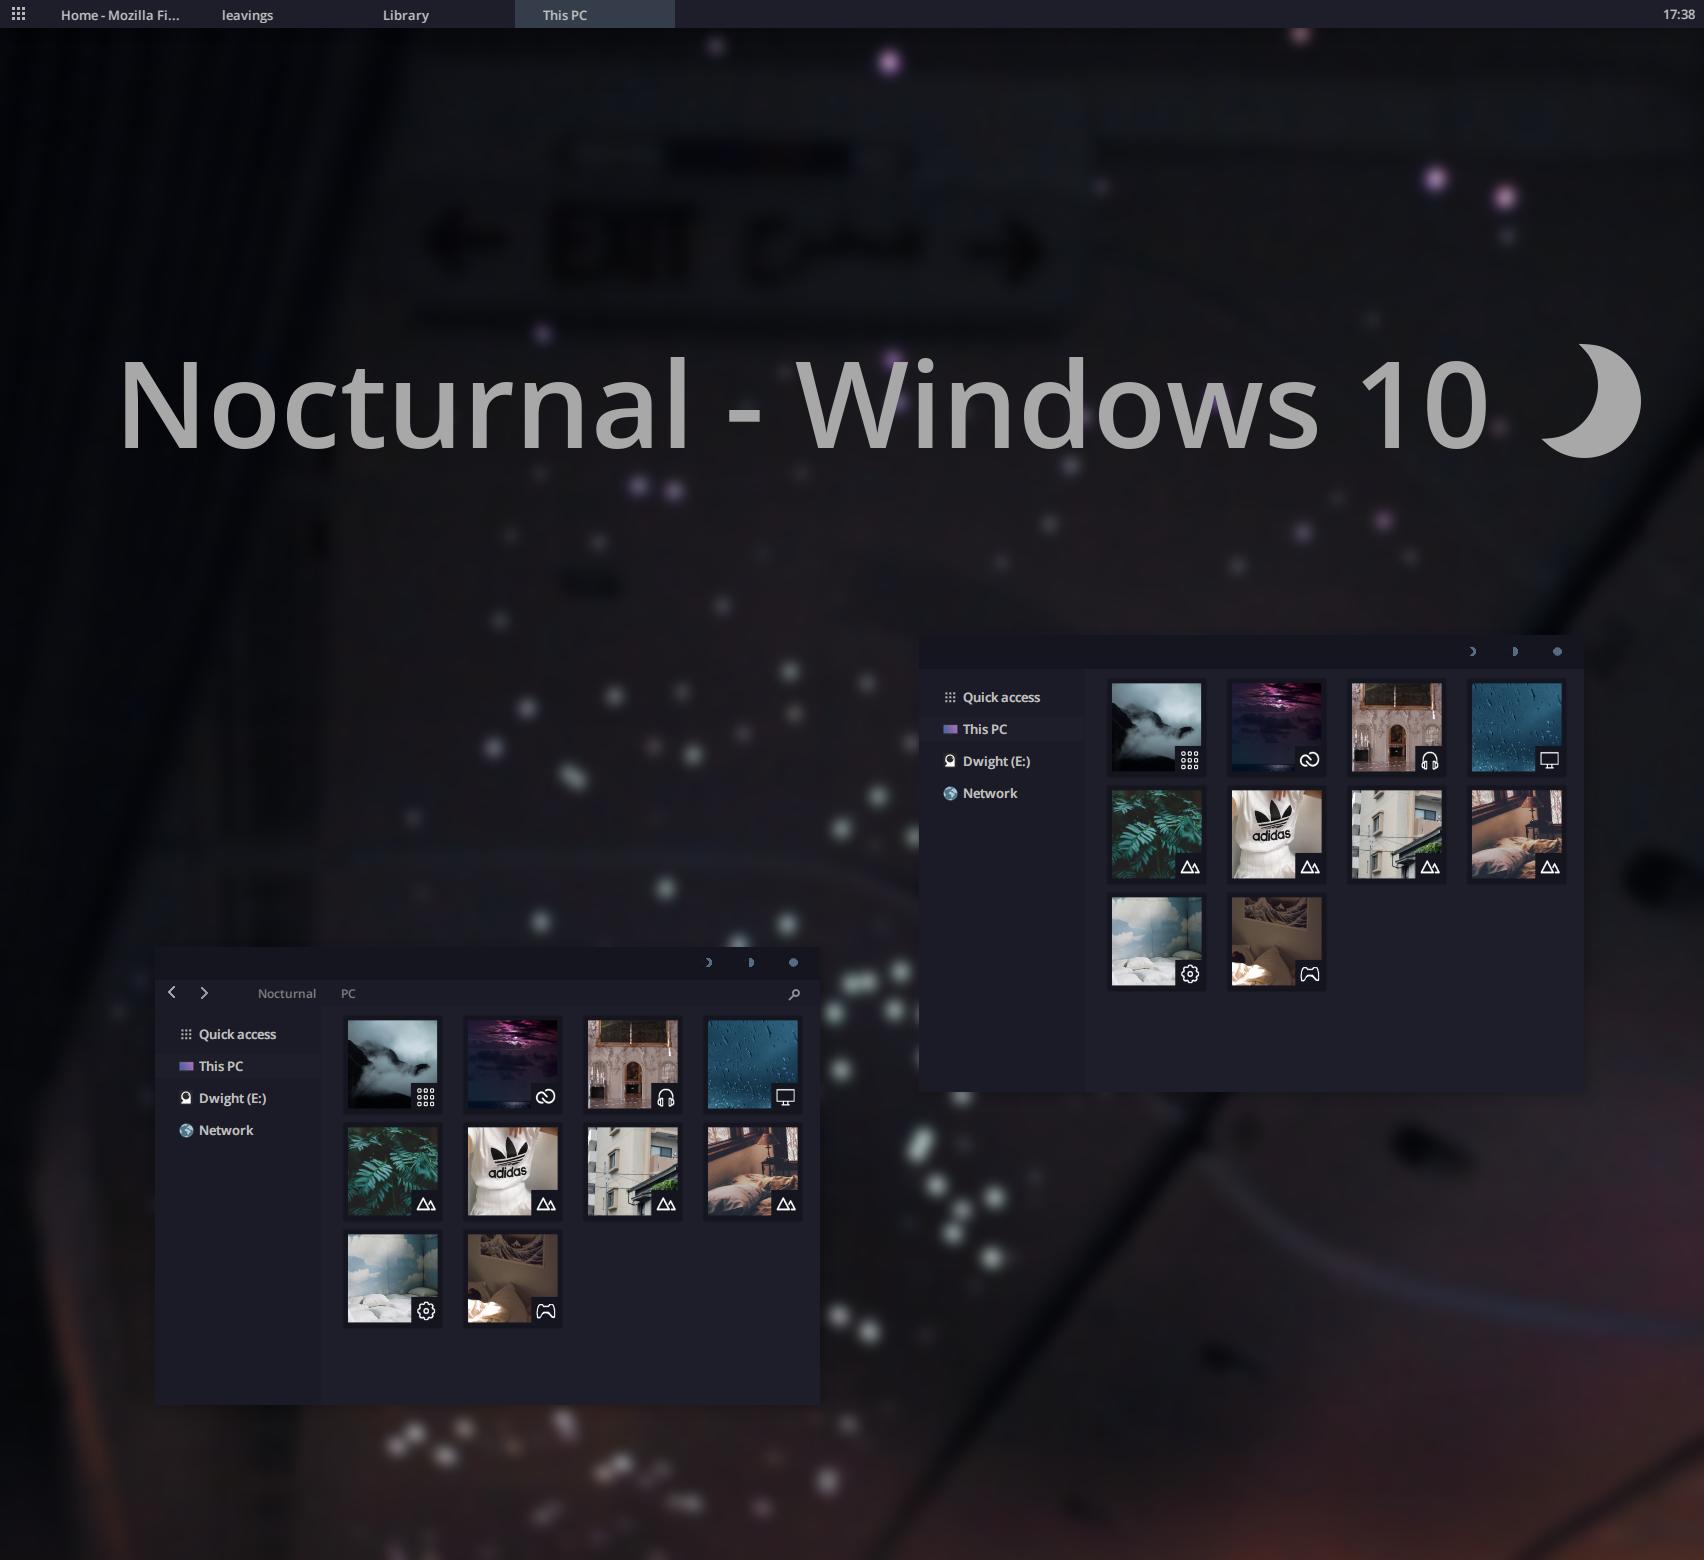 Nocturnal W10